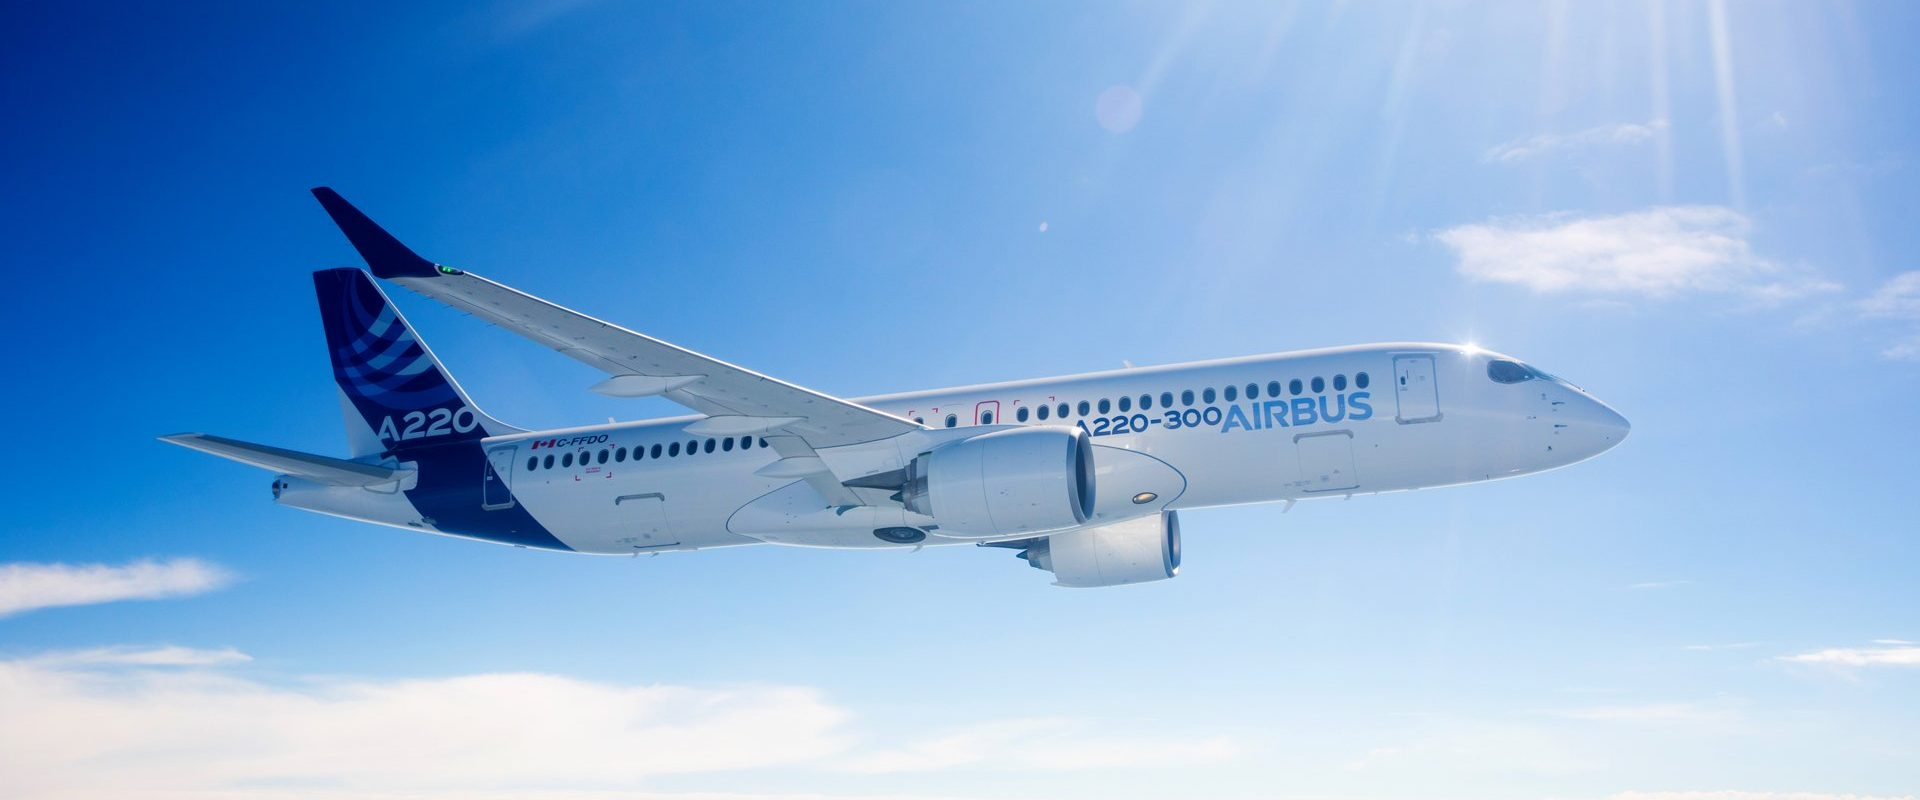 Airbus удлинил полёт A220